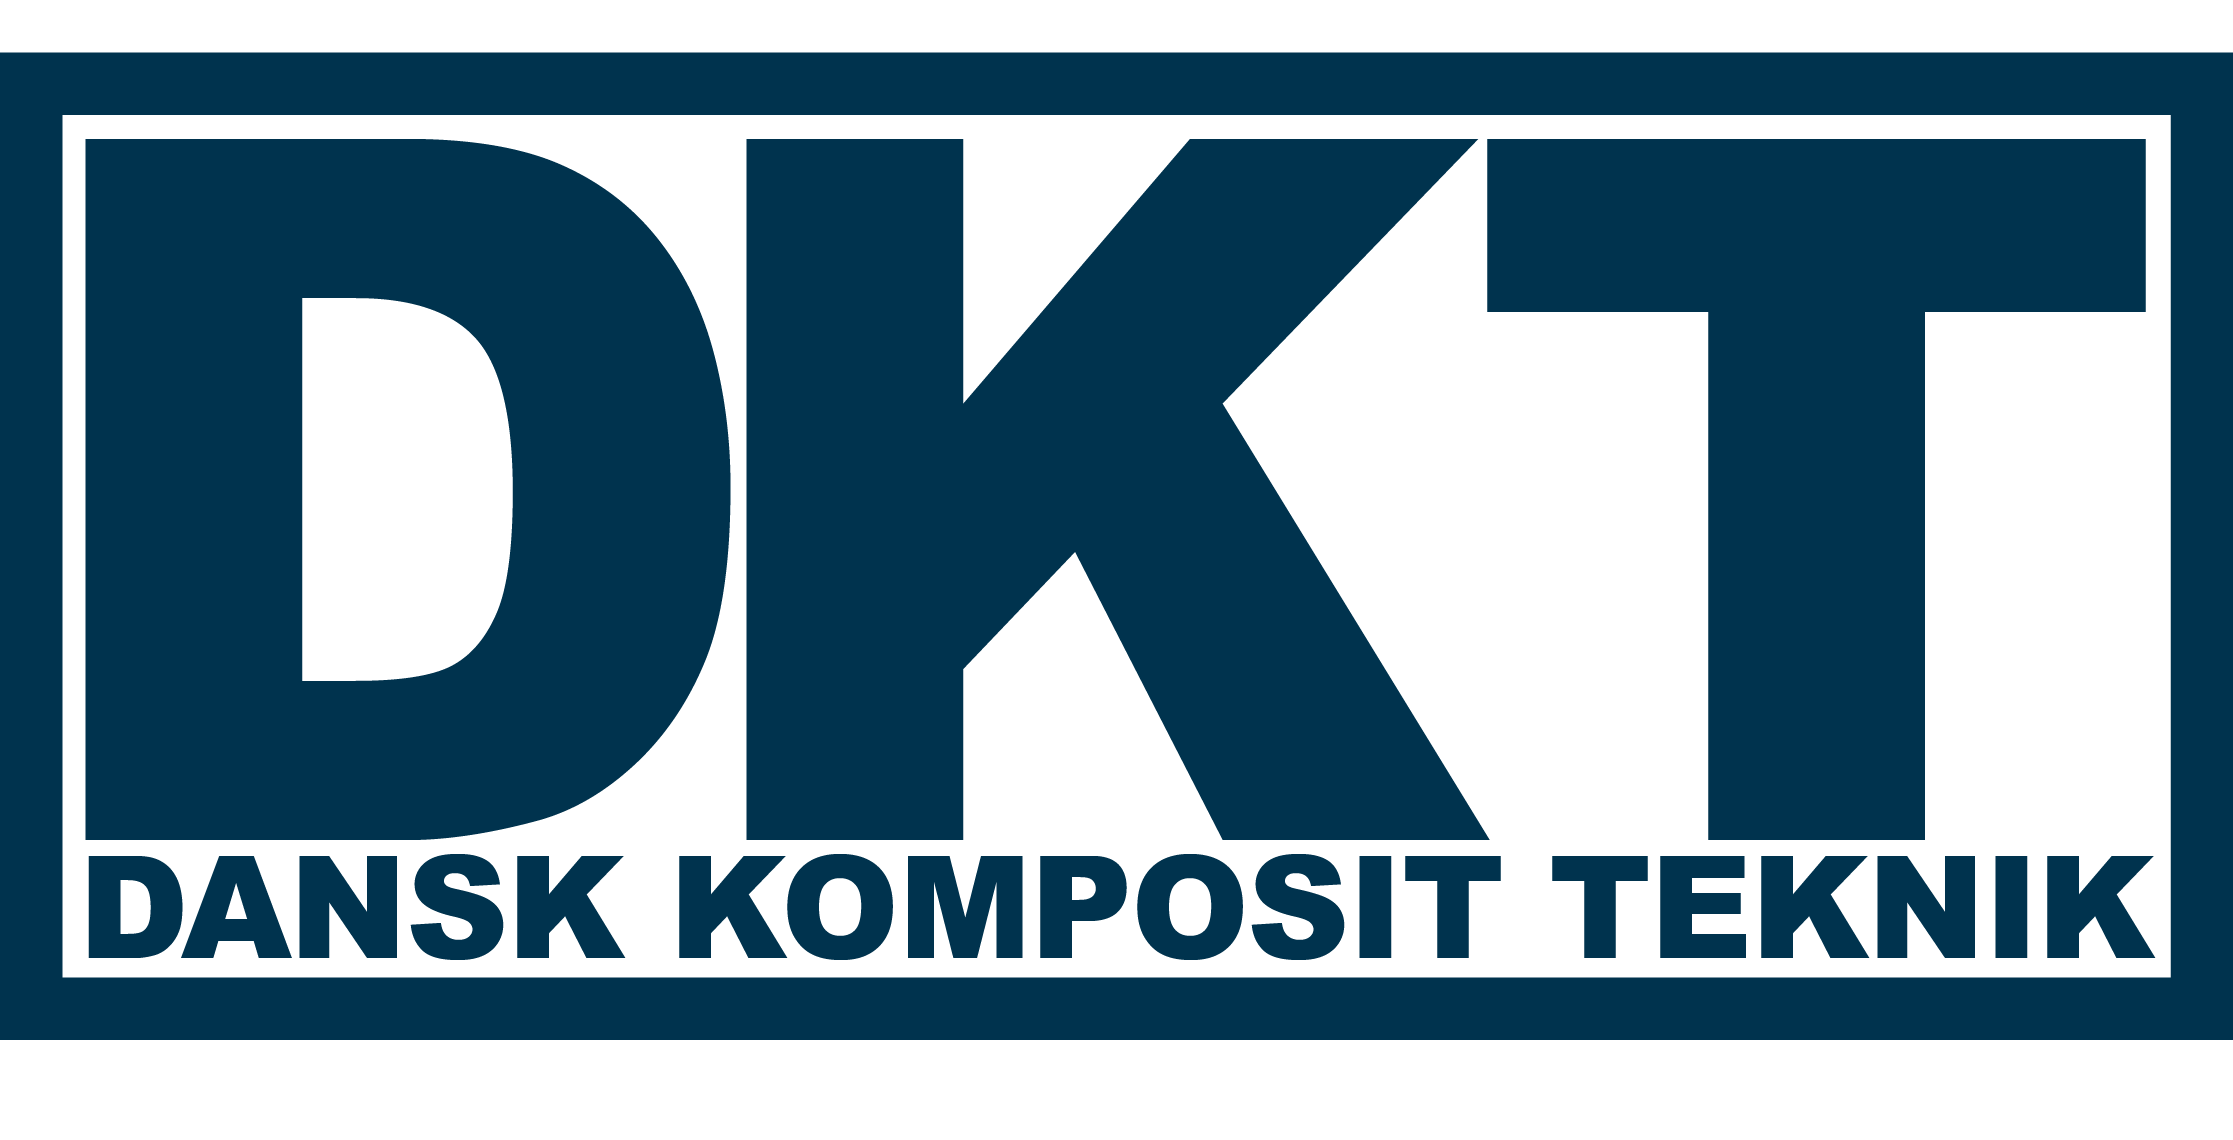 Dansk Komposit Teknik